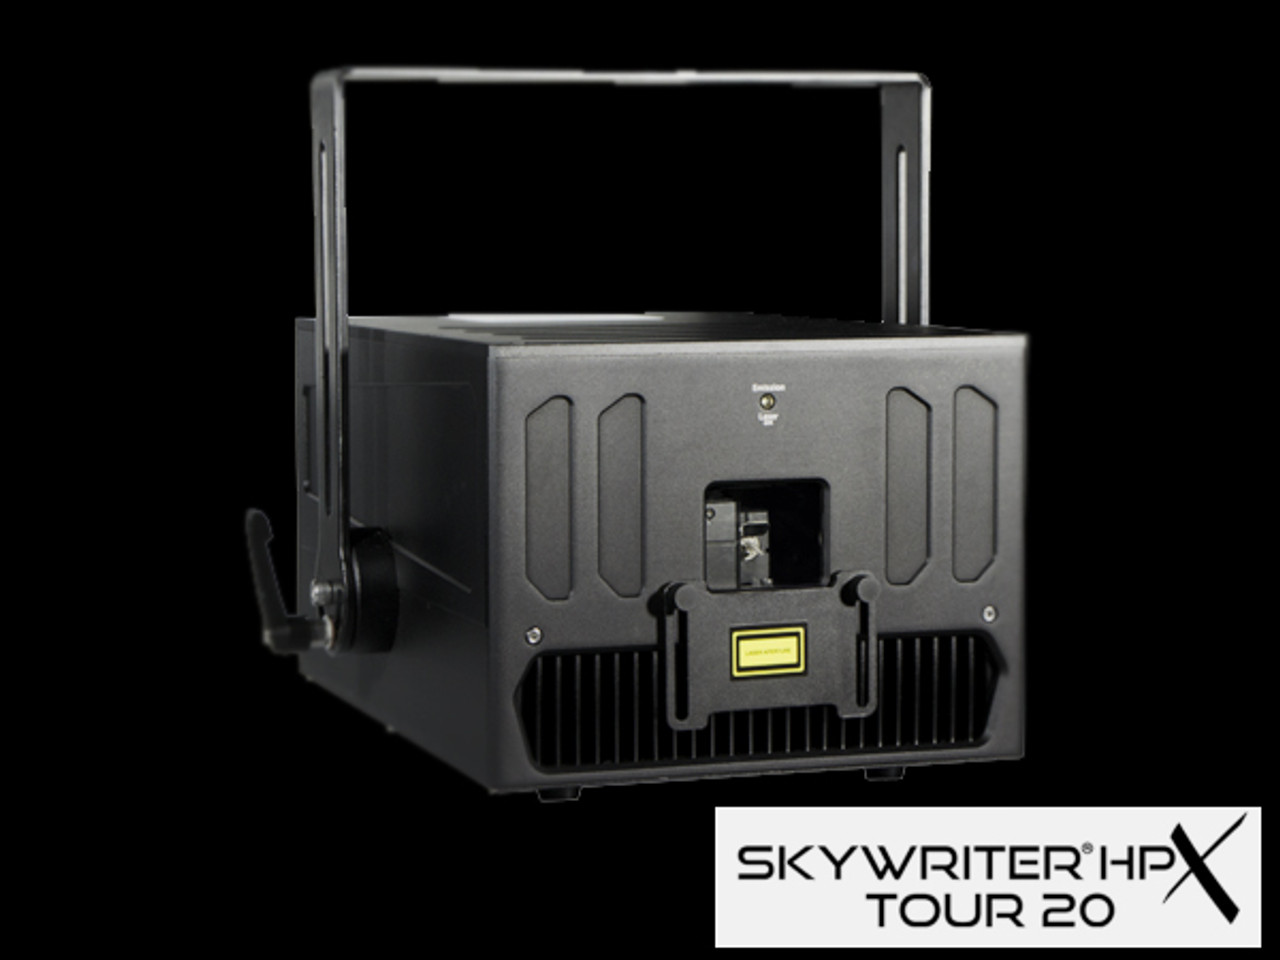 Skywriter HPX 20 (20W full RGB)